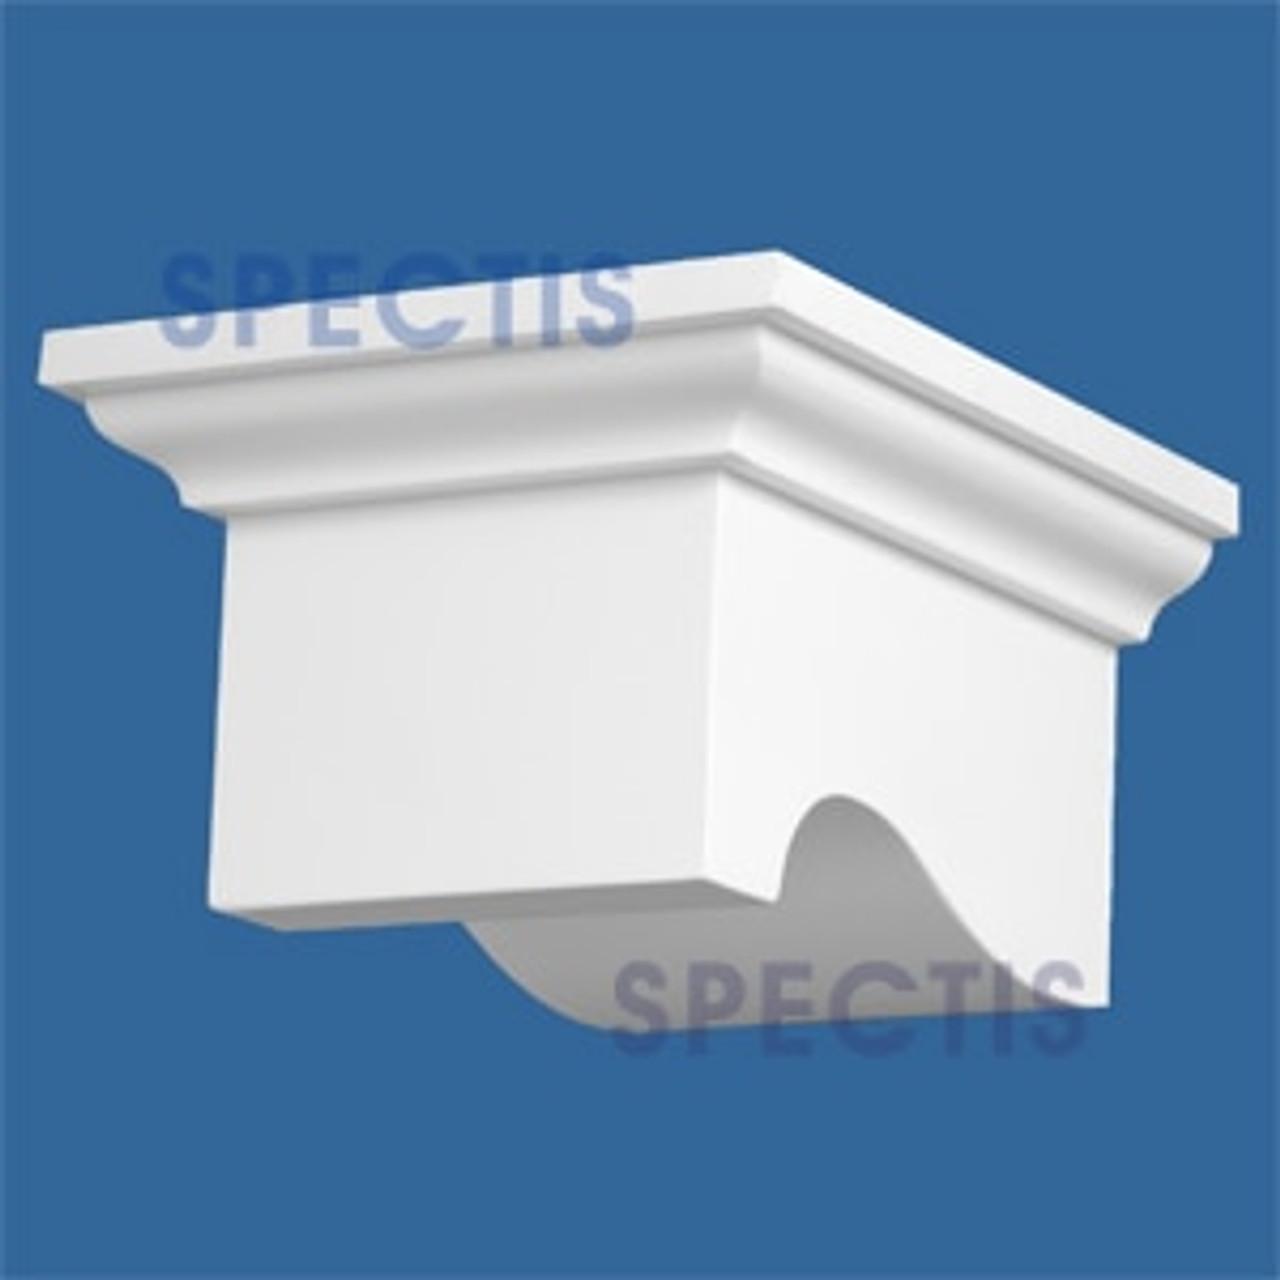 "BL2848 Corbel Block or Eave Bracket 8""W x 5.3""H x 9.5"" P"